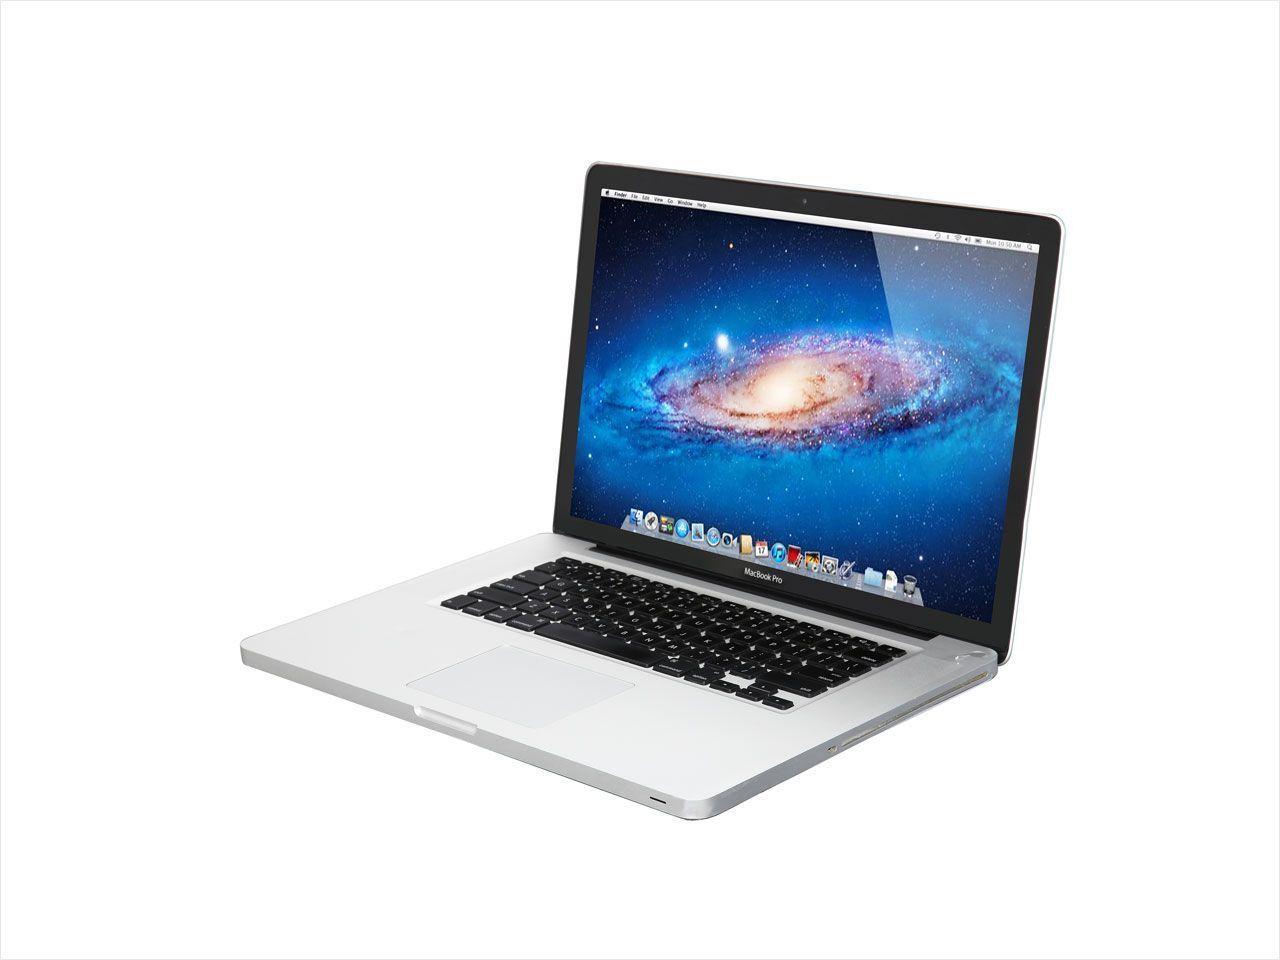 Macbook Pro - MacBook Pro 15-Inch 2009 2.53GHz 4GB RAM 250 HD MC118LL/A